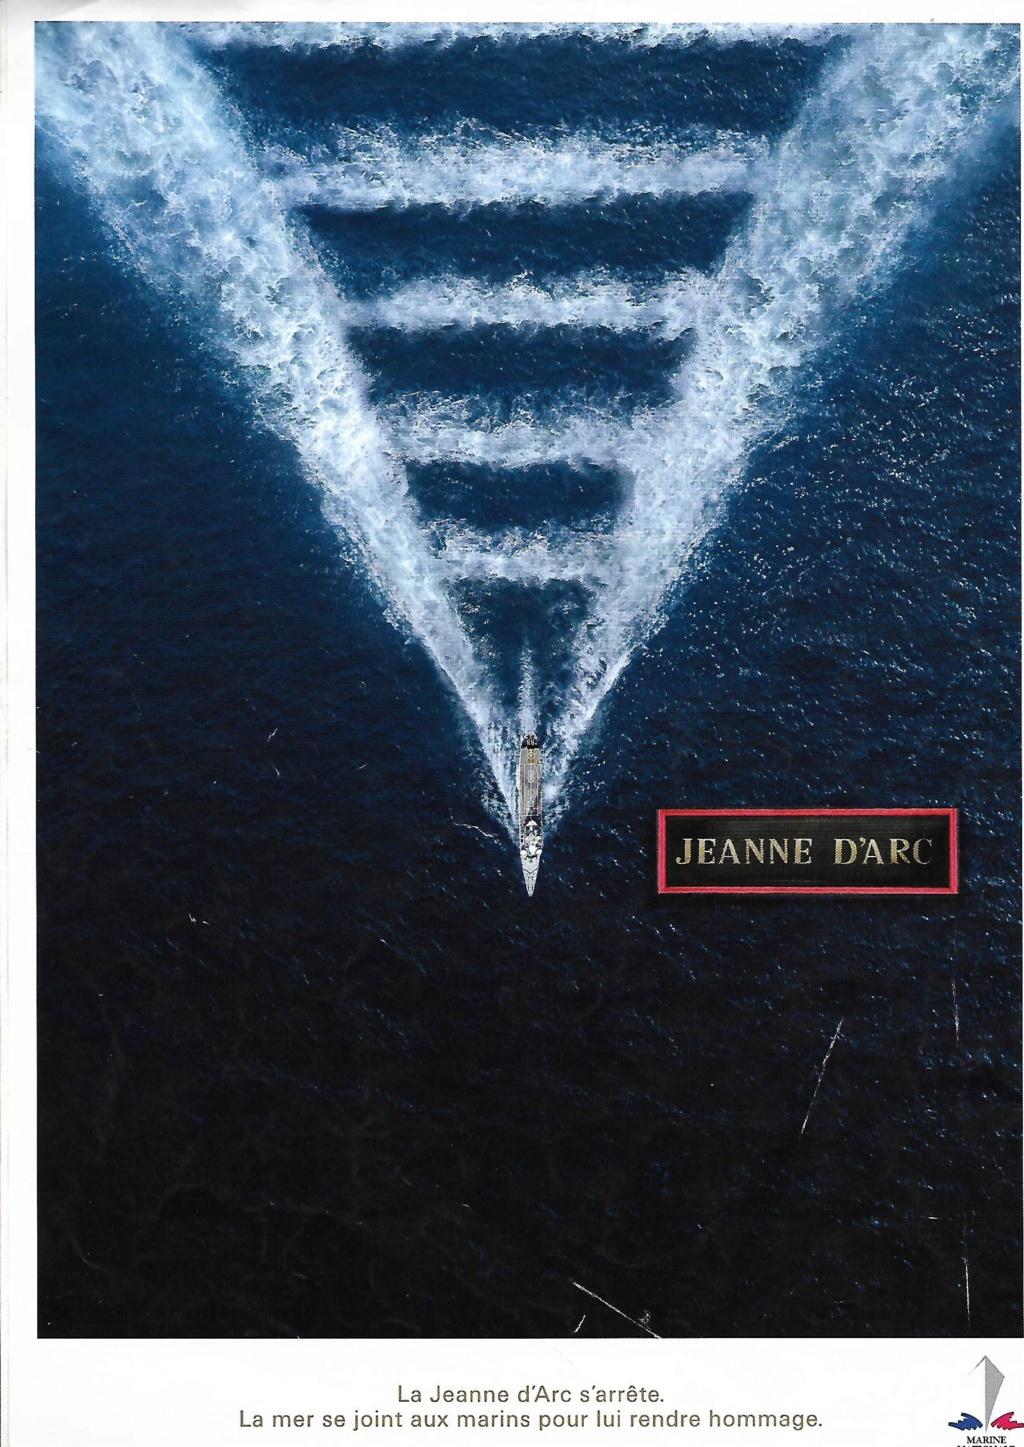 JEANNE D'ARC (PH) - VOLUME 4 - Page 22 Scan_230